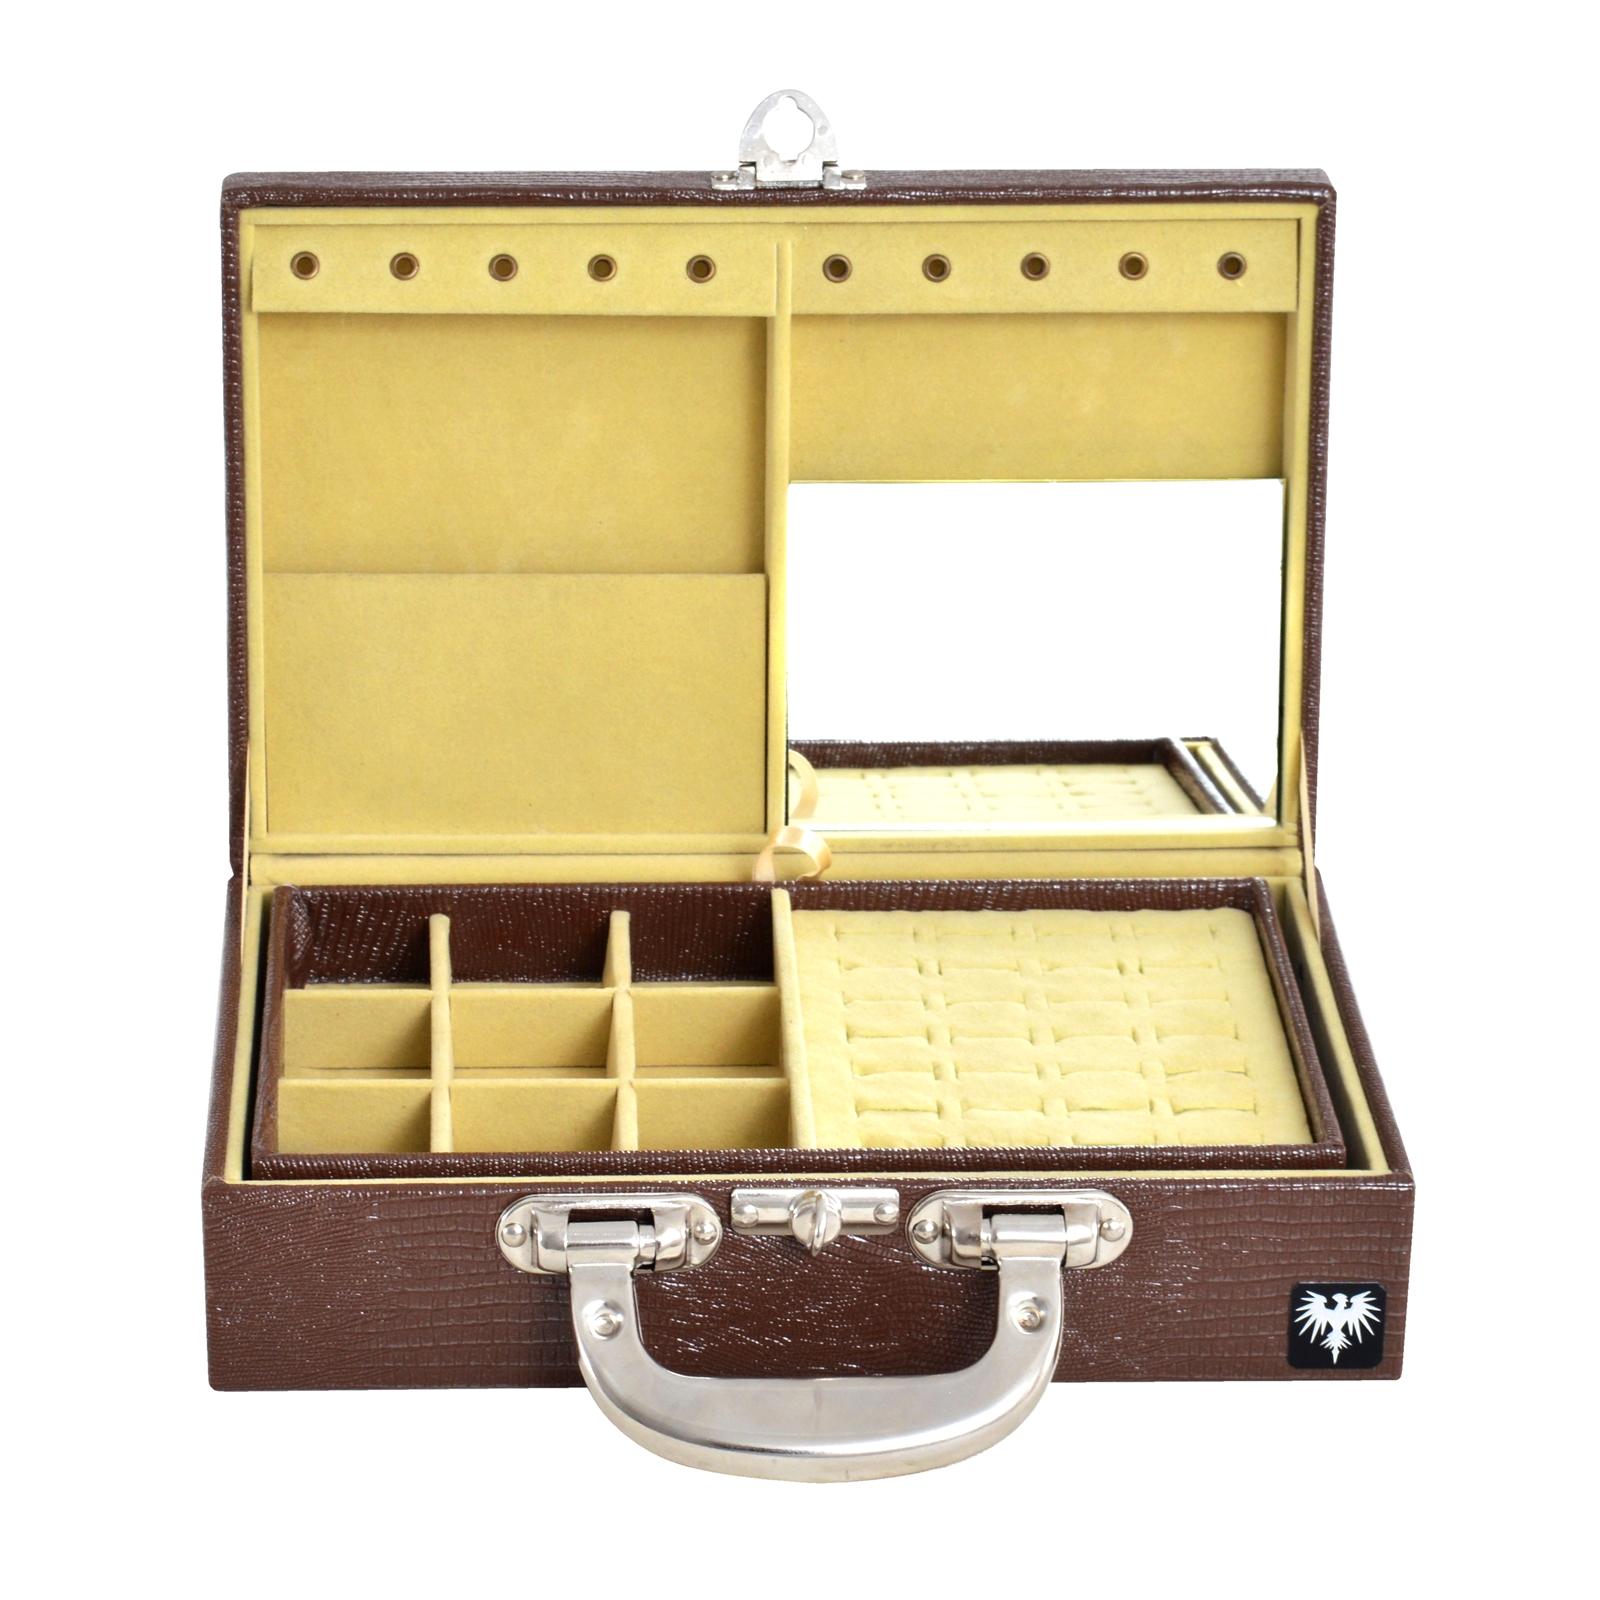 maleta-porta-joias-couro-ecologico-croco-marrom-bege-imagem-3.jpg